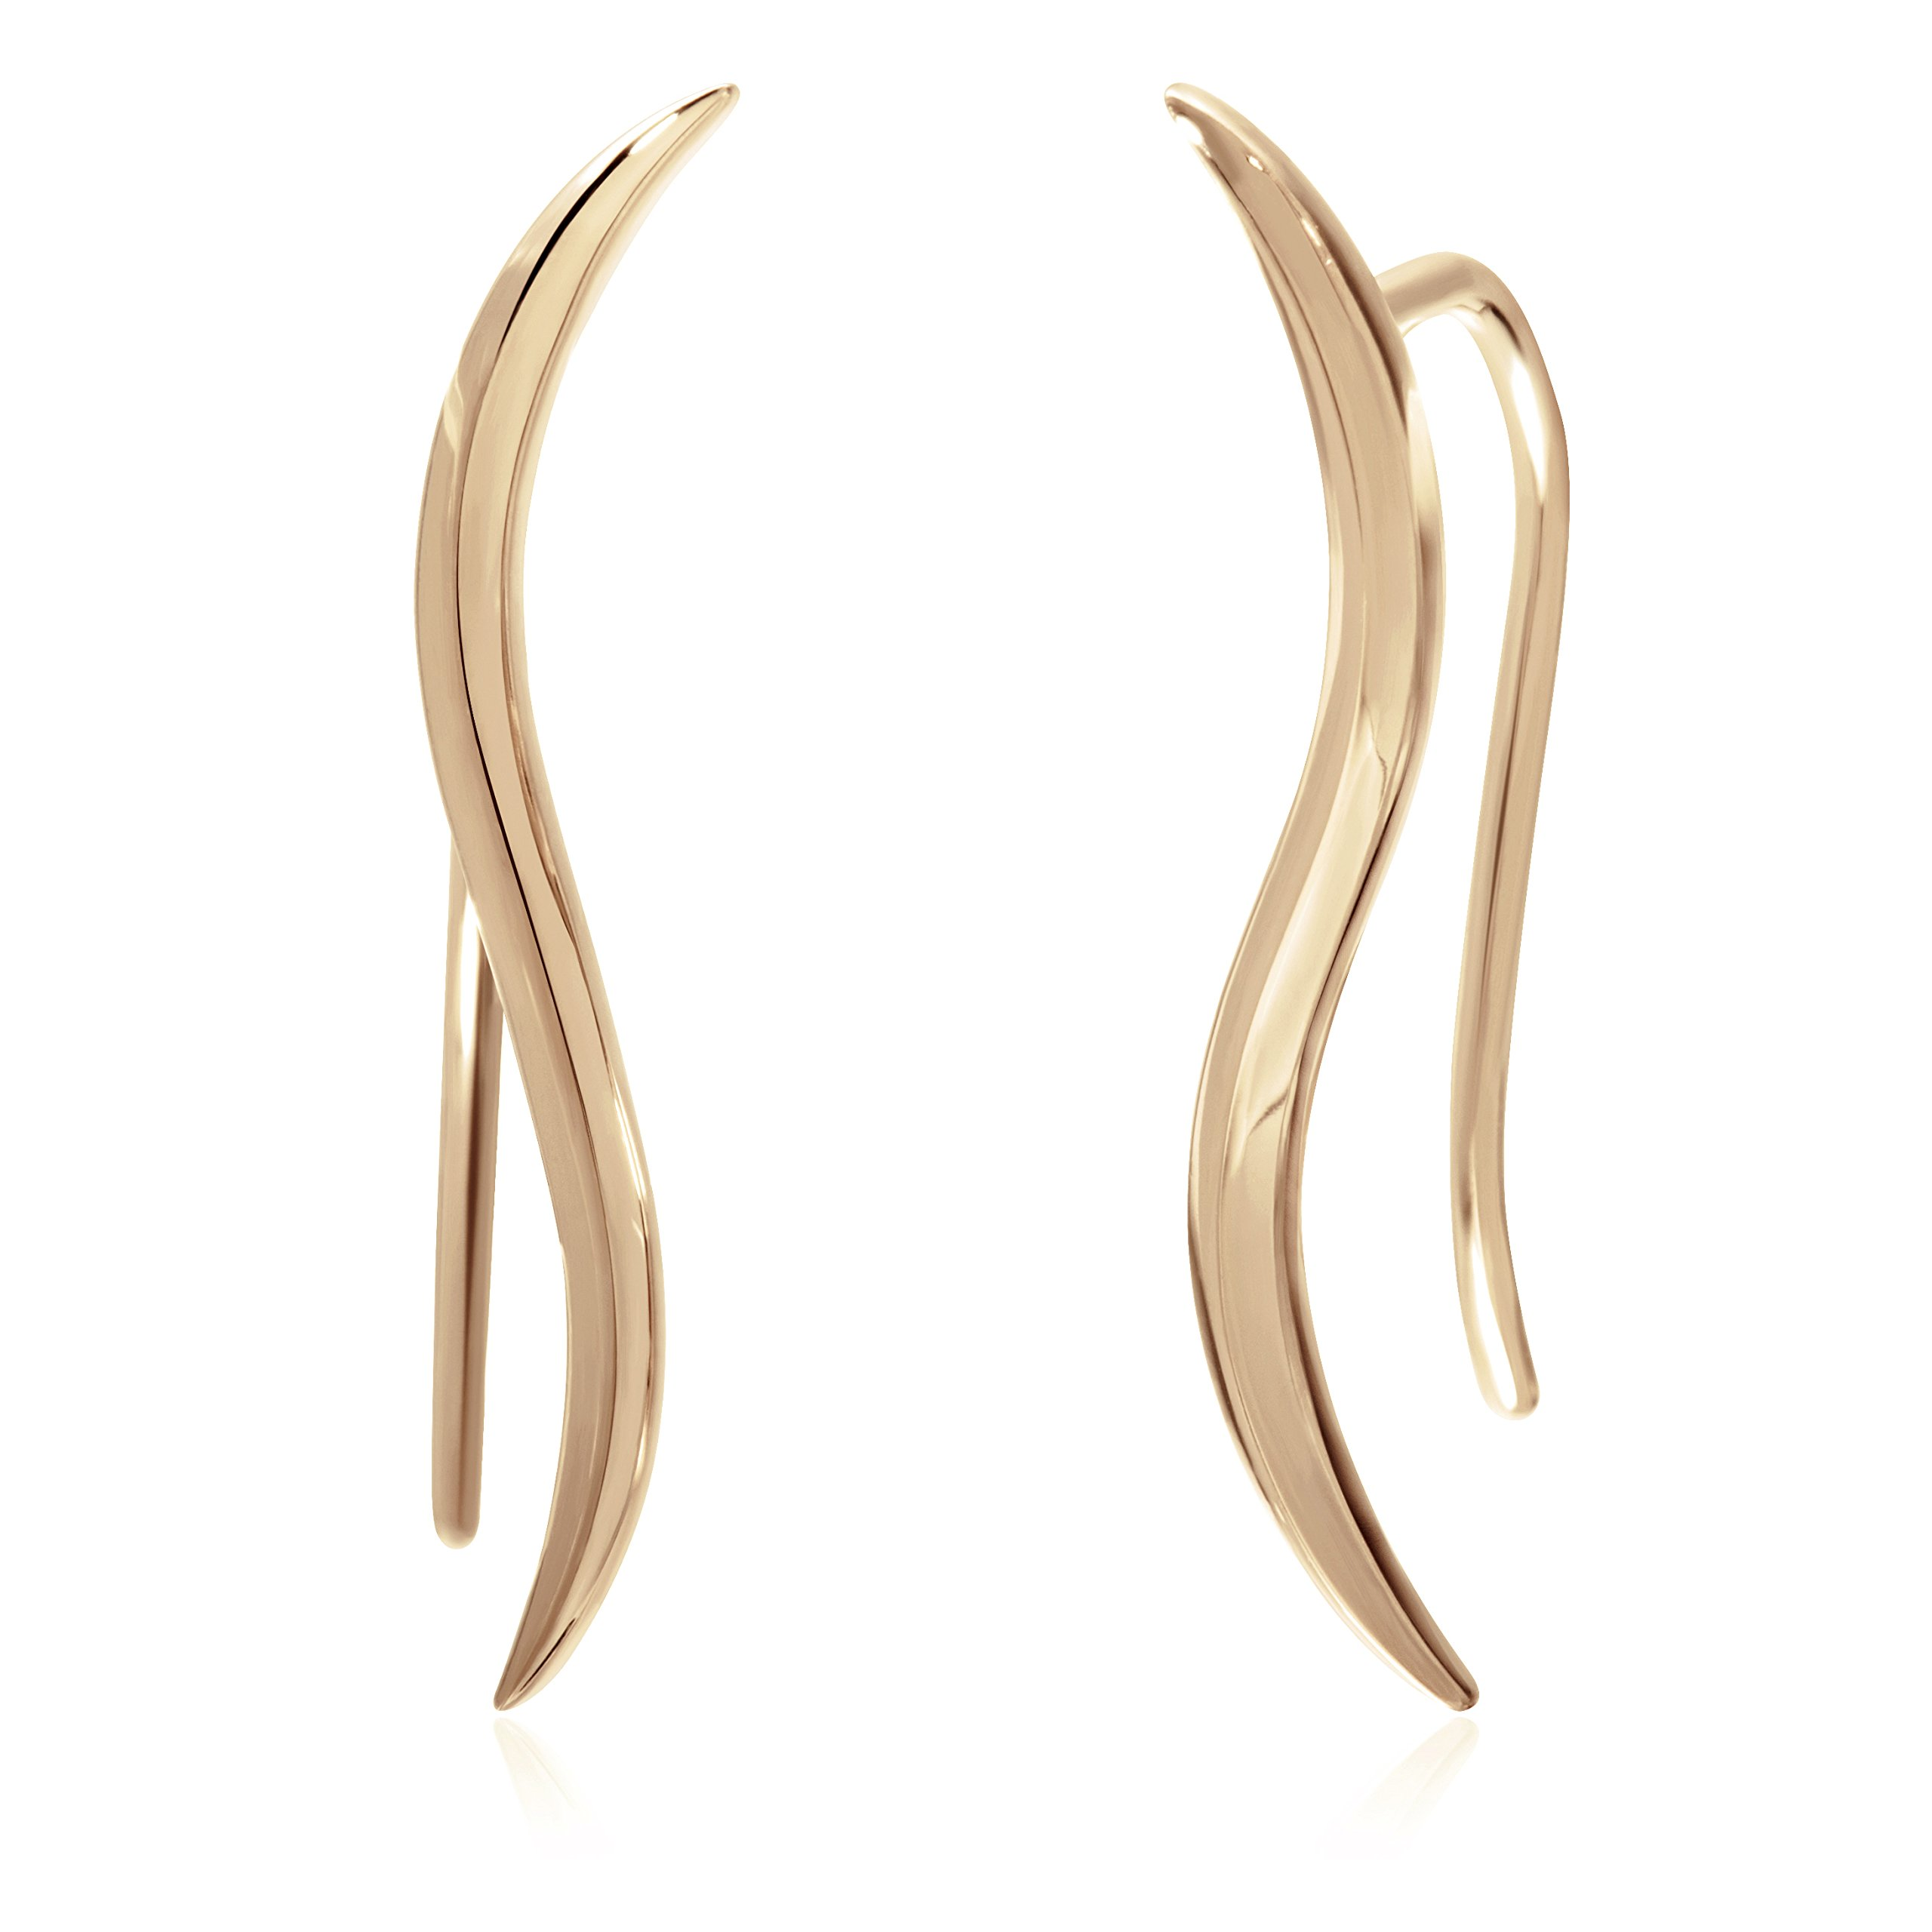 S.Leaf Sterling Silver Ear Crawler Cuff Earrings Minimal Leaf Climber Earrings (Gold)